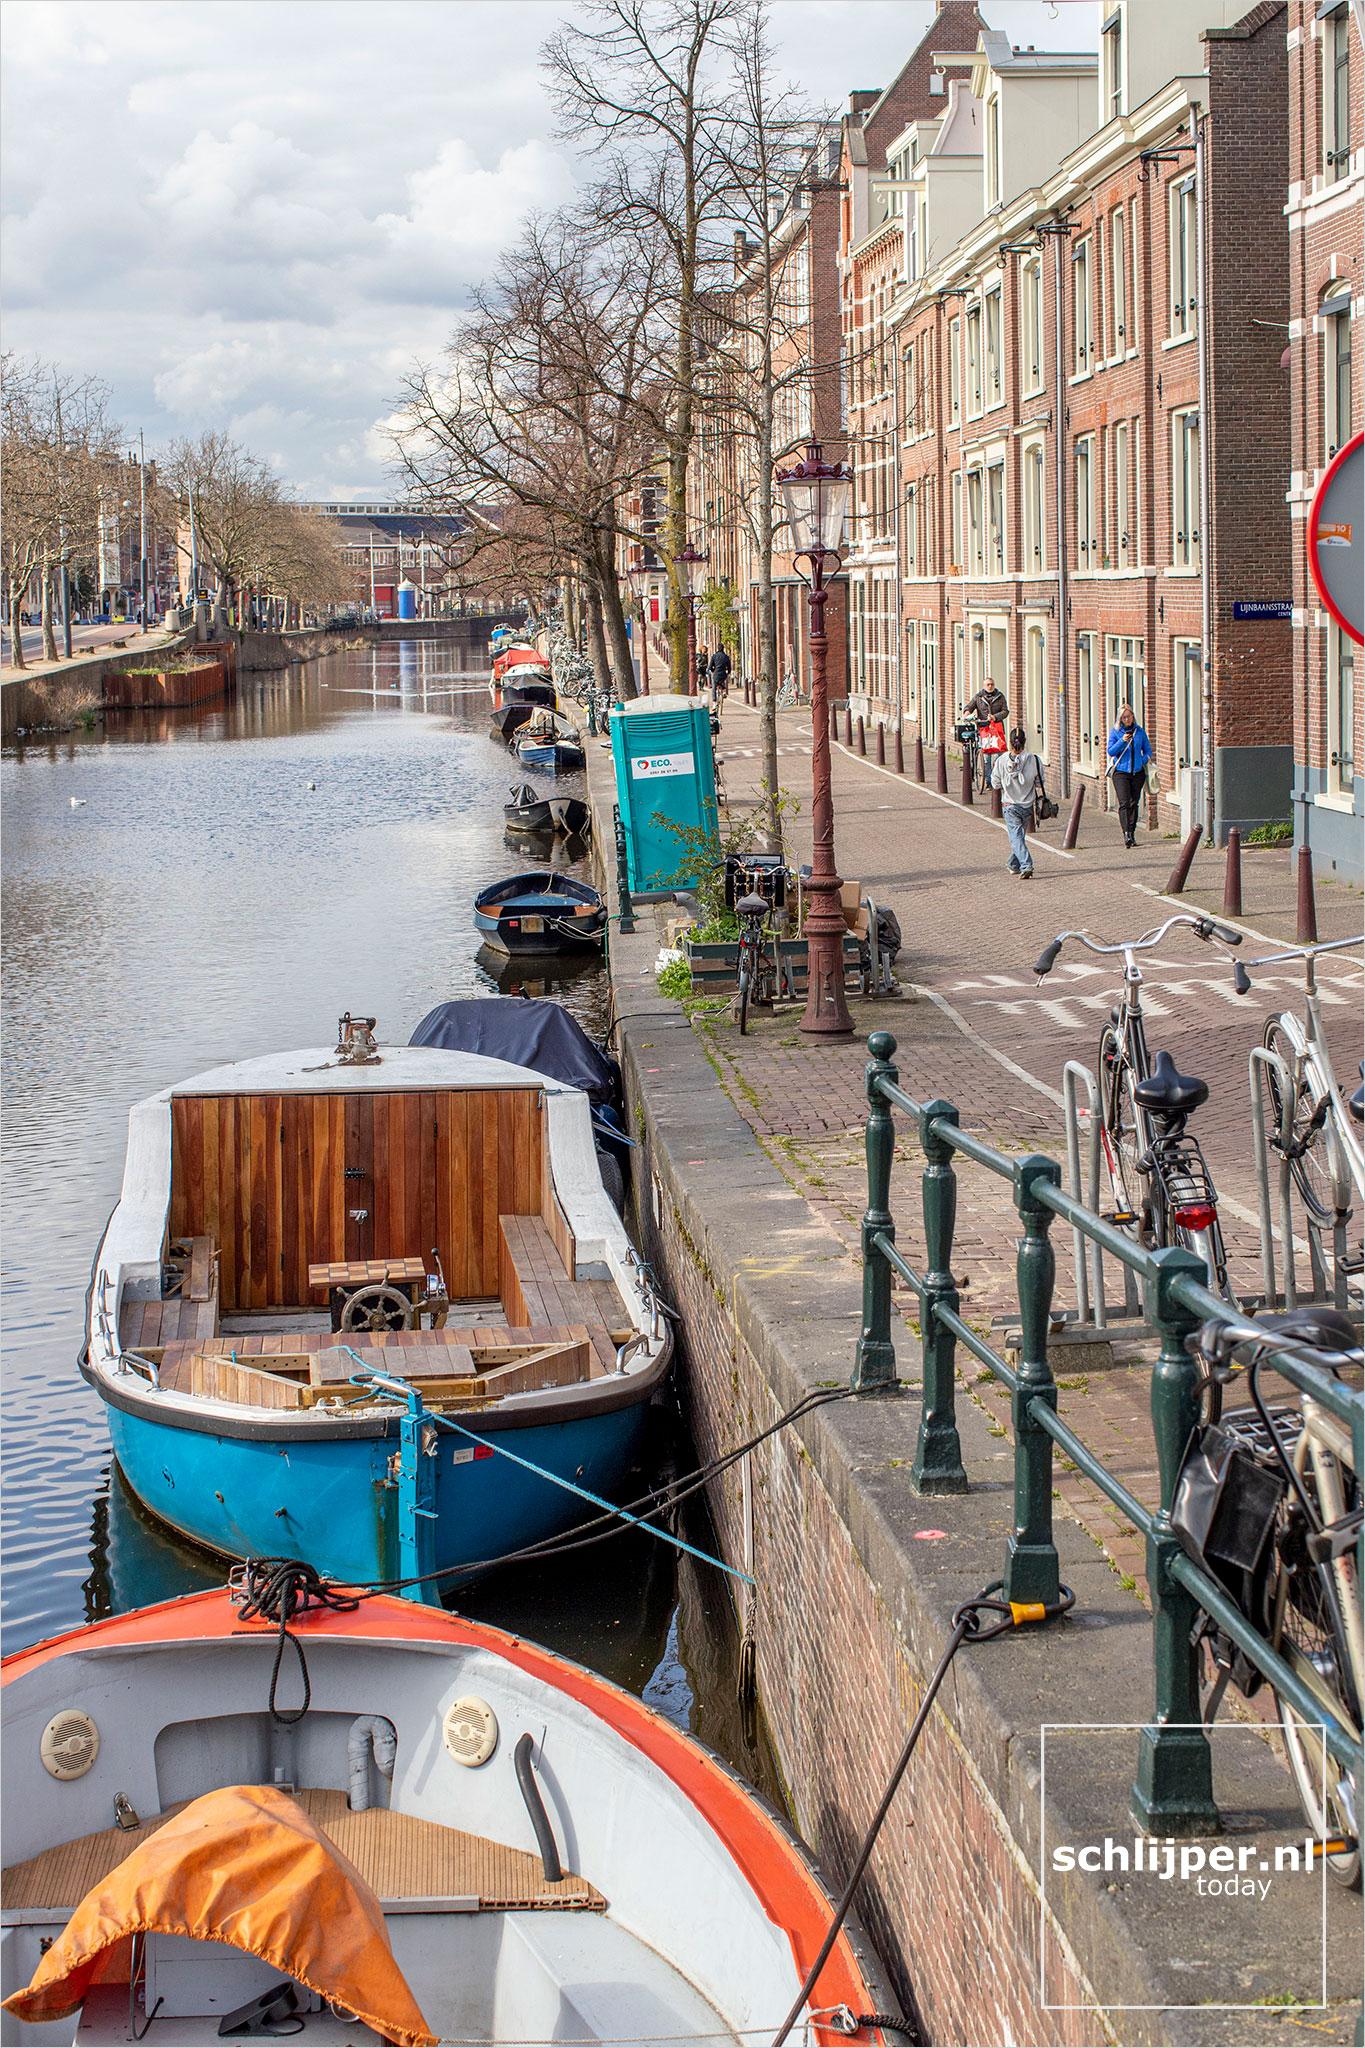 The Netherlands, Amsterdam, 15 april 2021